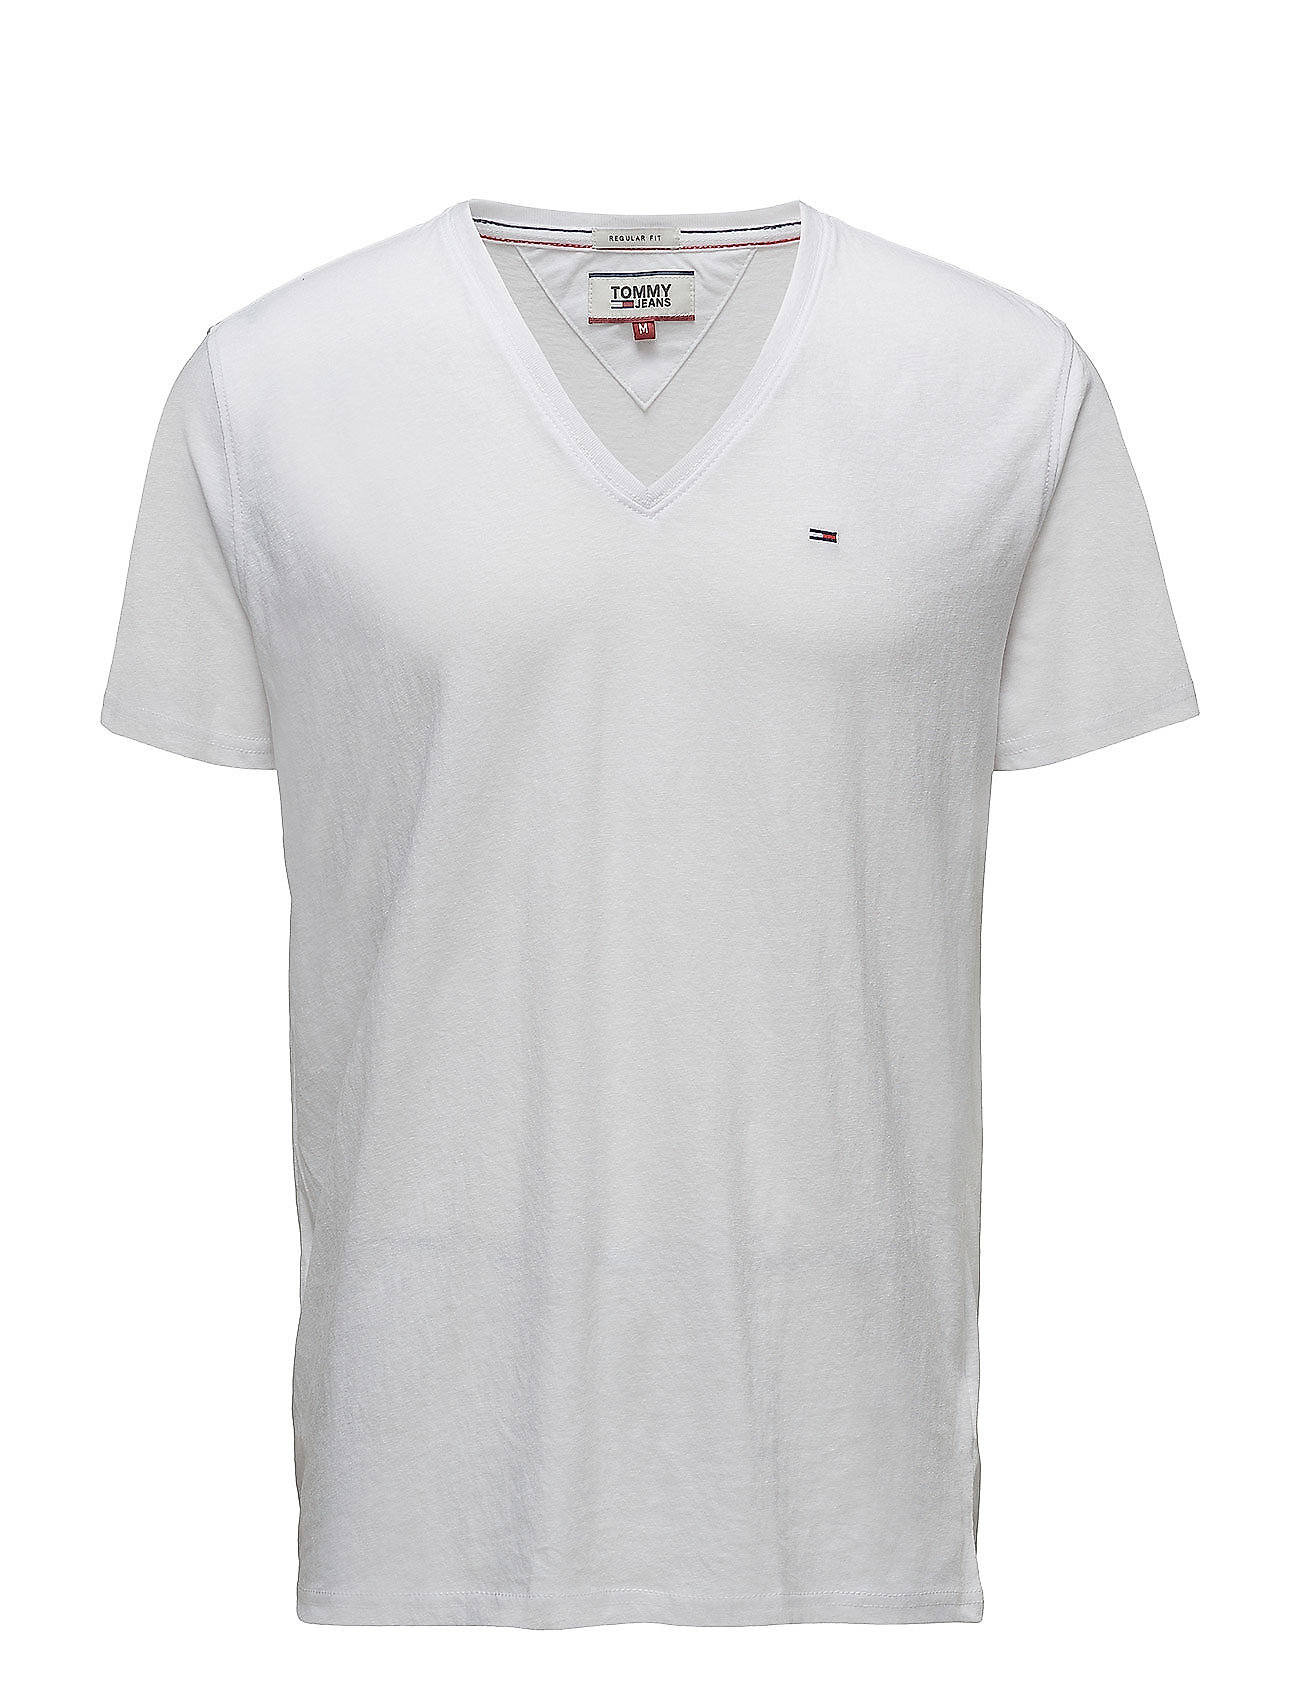 Tommy Jeans TJM ORIGINAL TRIBLEN - CLASSIC WHITE